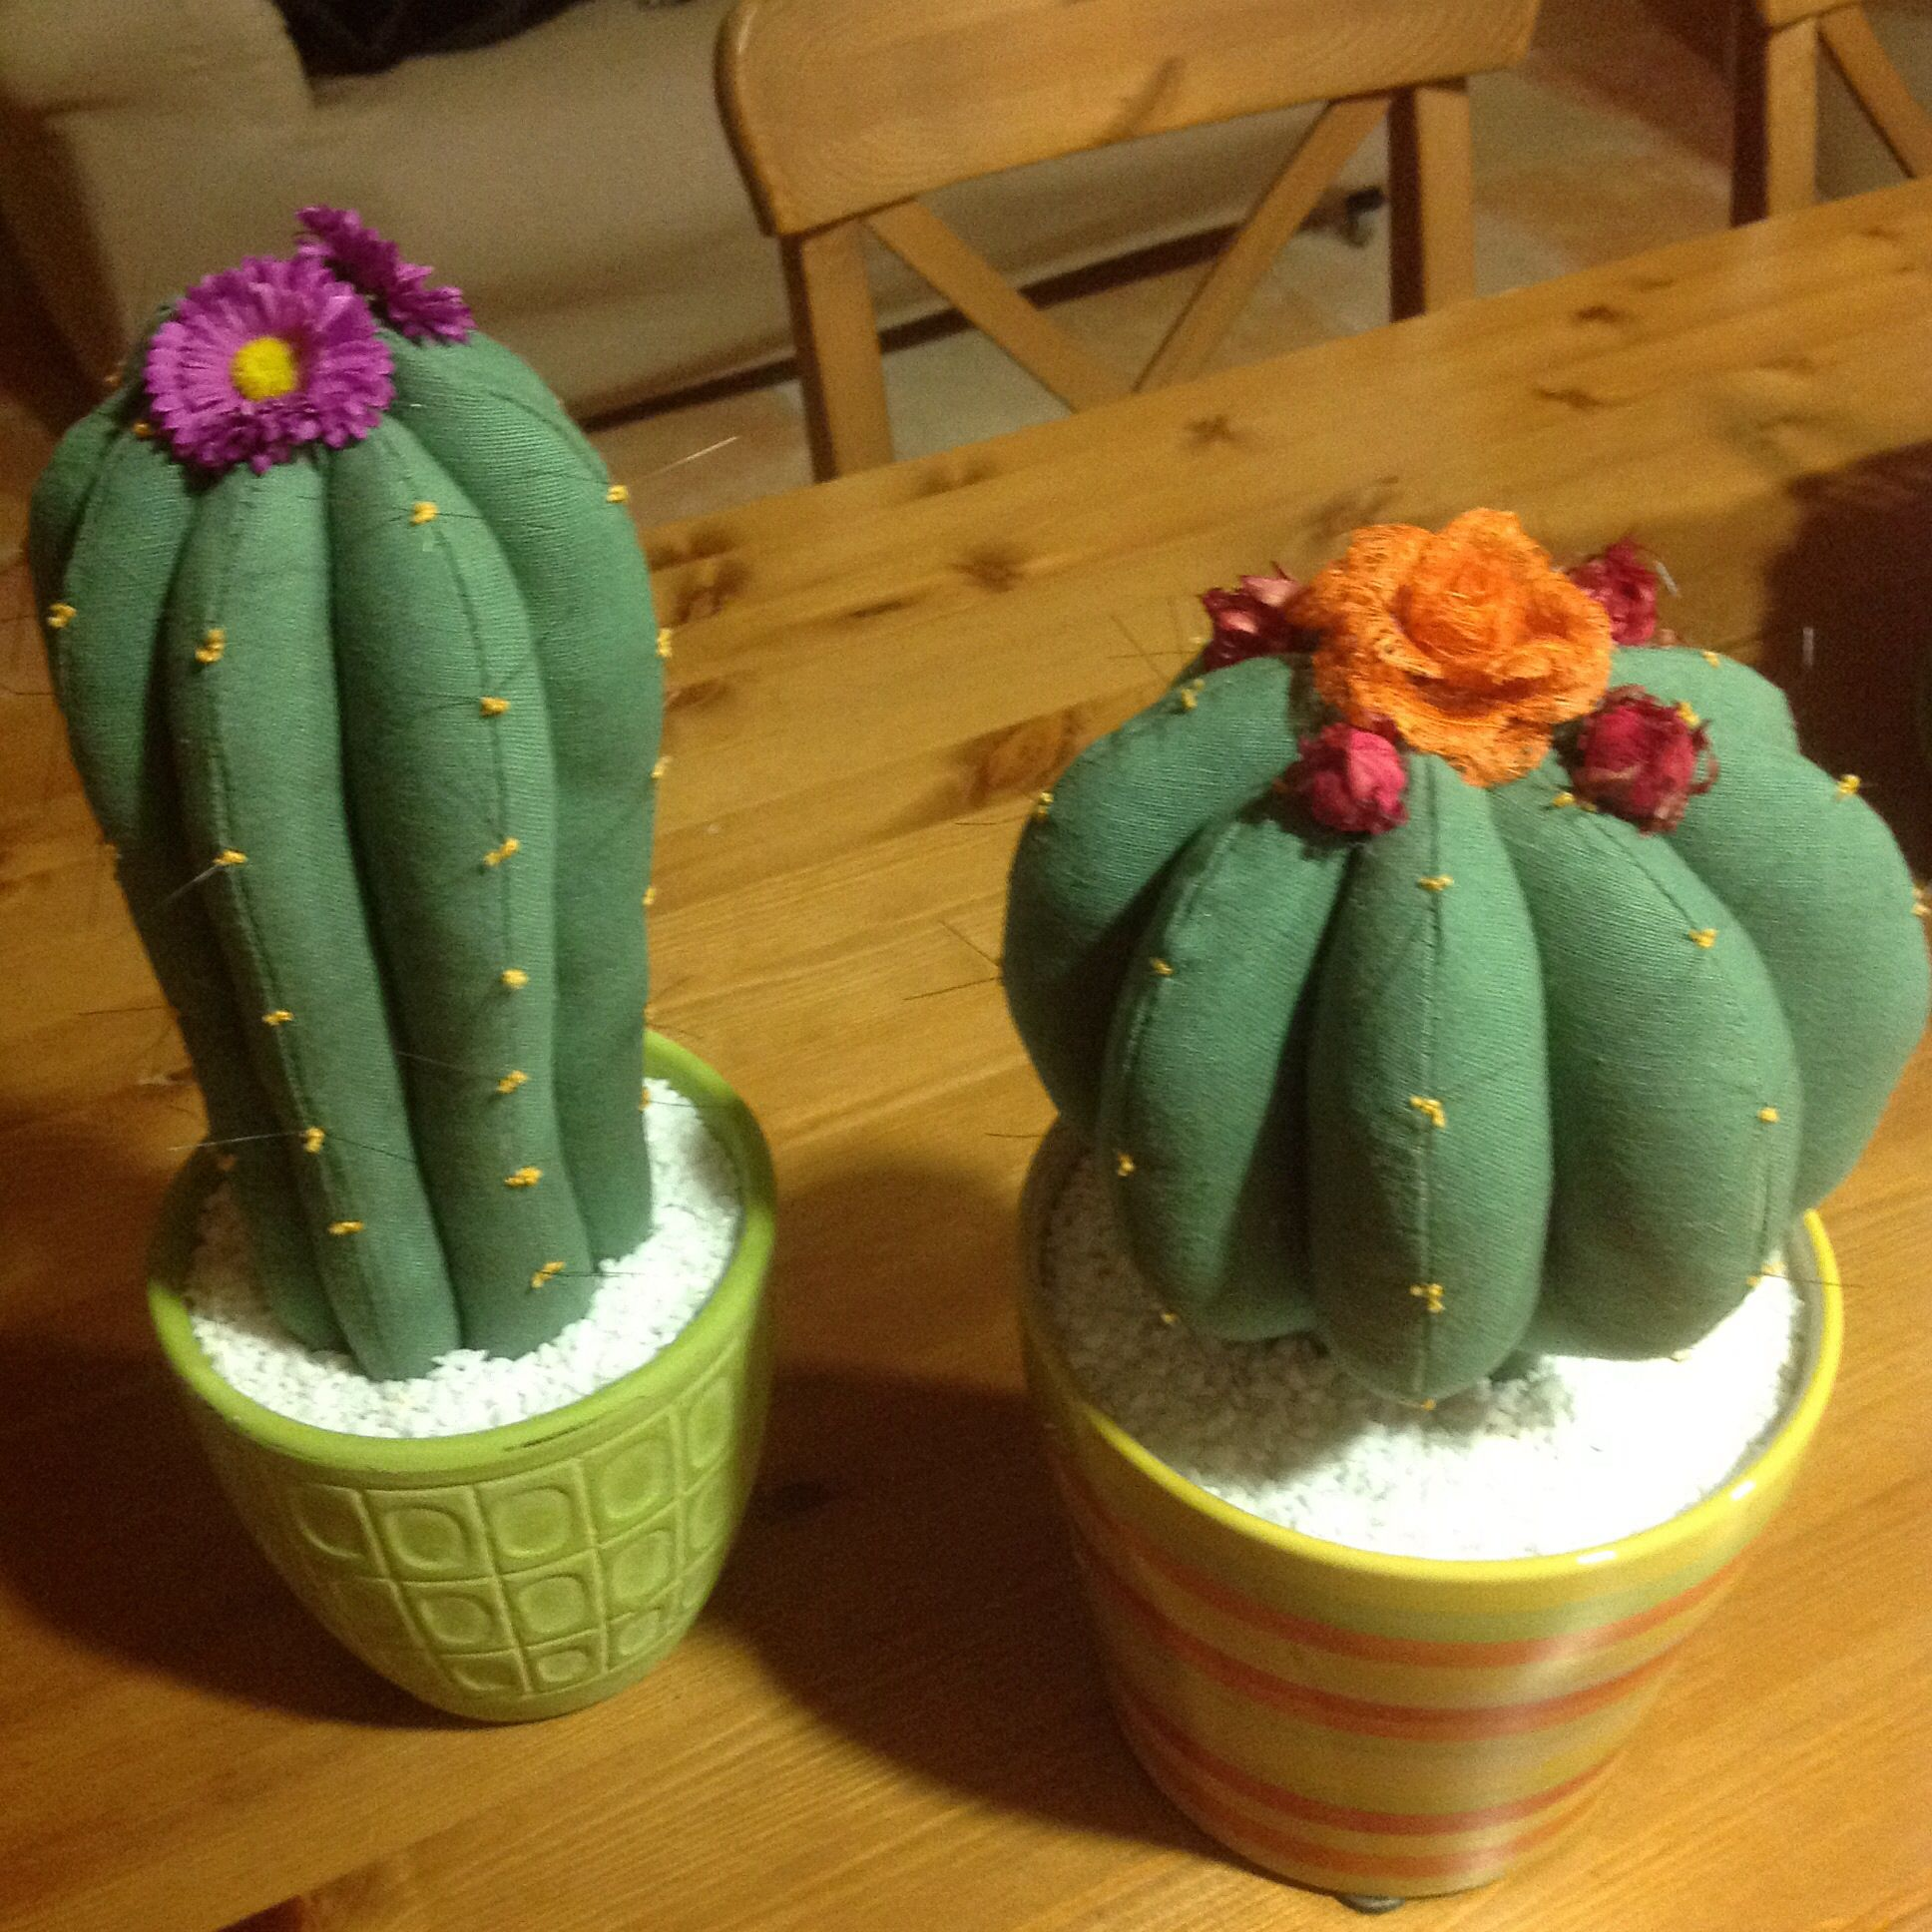 Cactus de tela manualidades pinterest cacti felting - Manualidades de tela ...